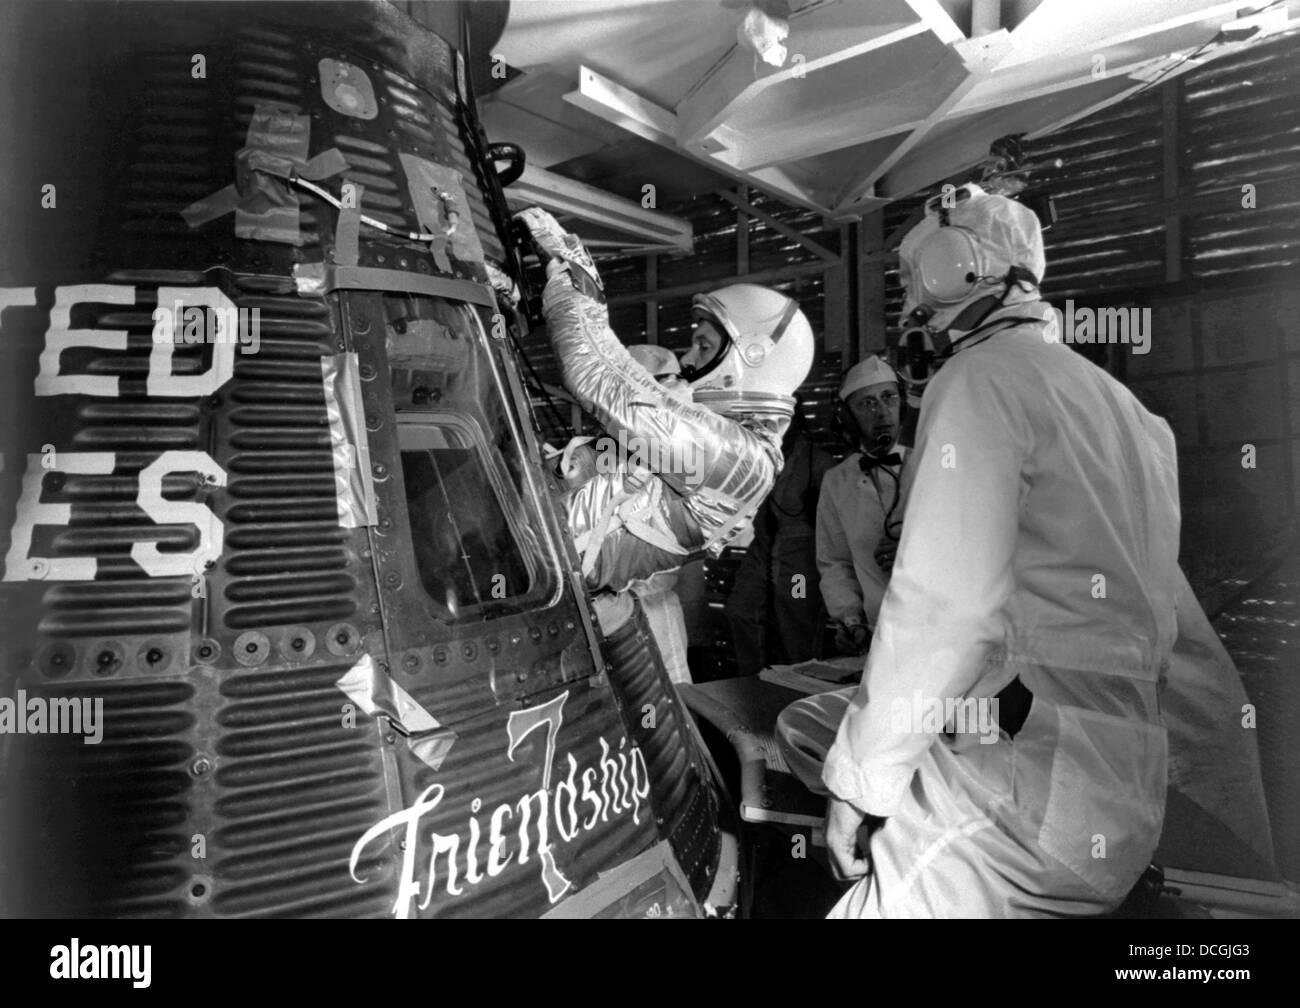 Digitally restored photo of astronaut John Glenn entering the Friendship 7 spacecraft. - Stock Image